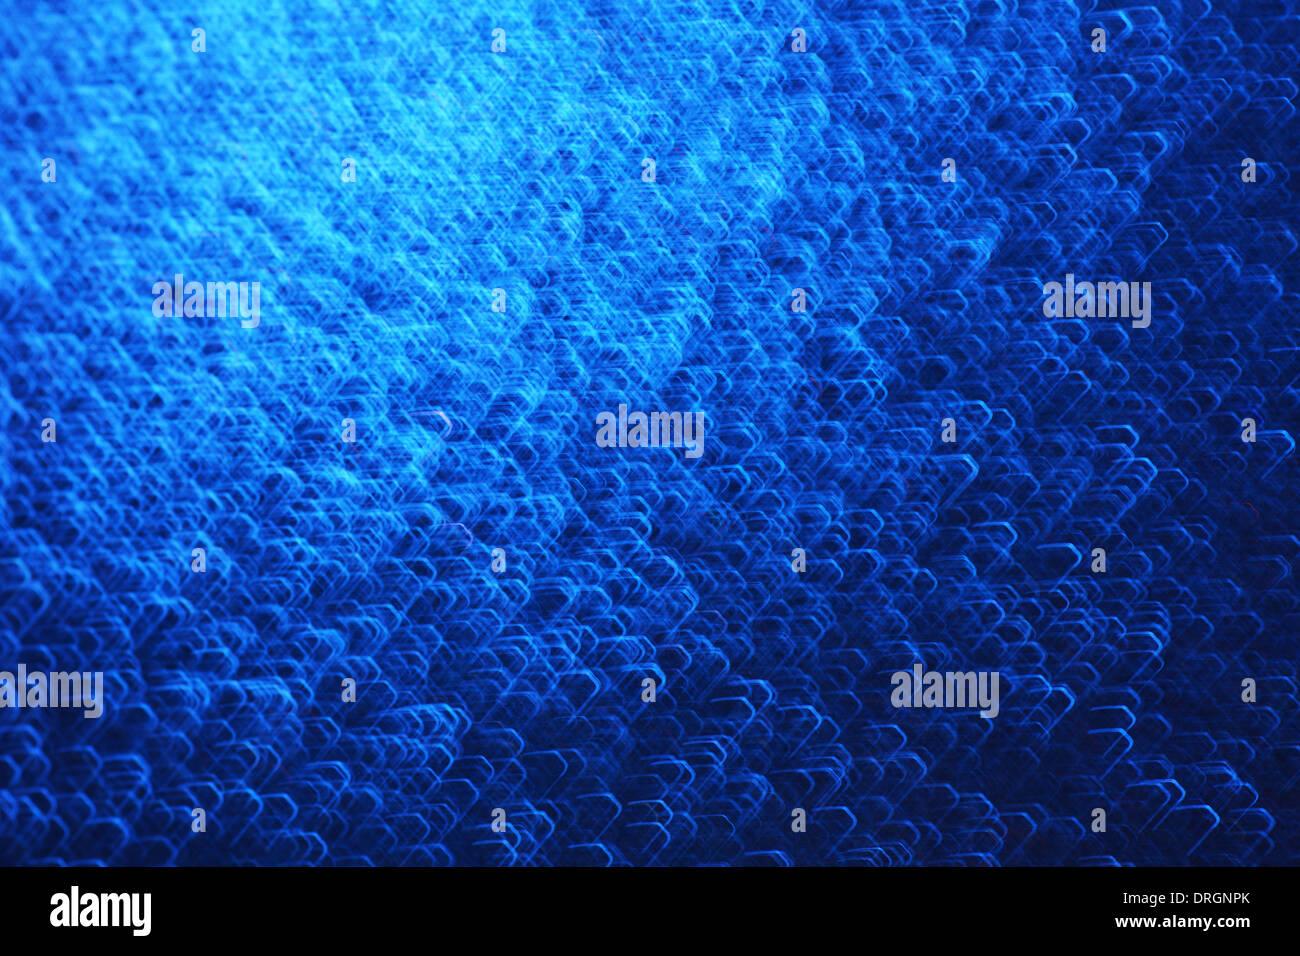 Fondo Azul Metálico Abstracto De Diseño Moderno De La: Fondo Azul Marino Degradado